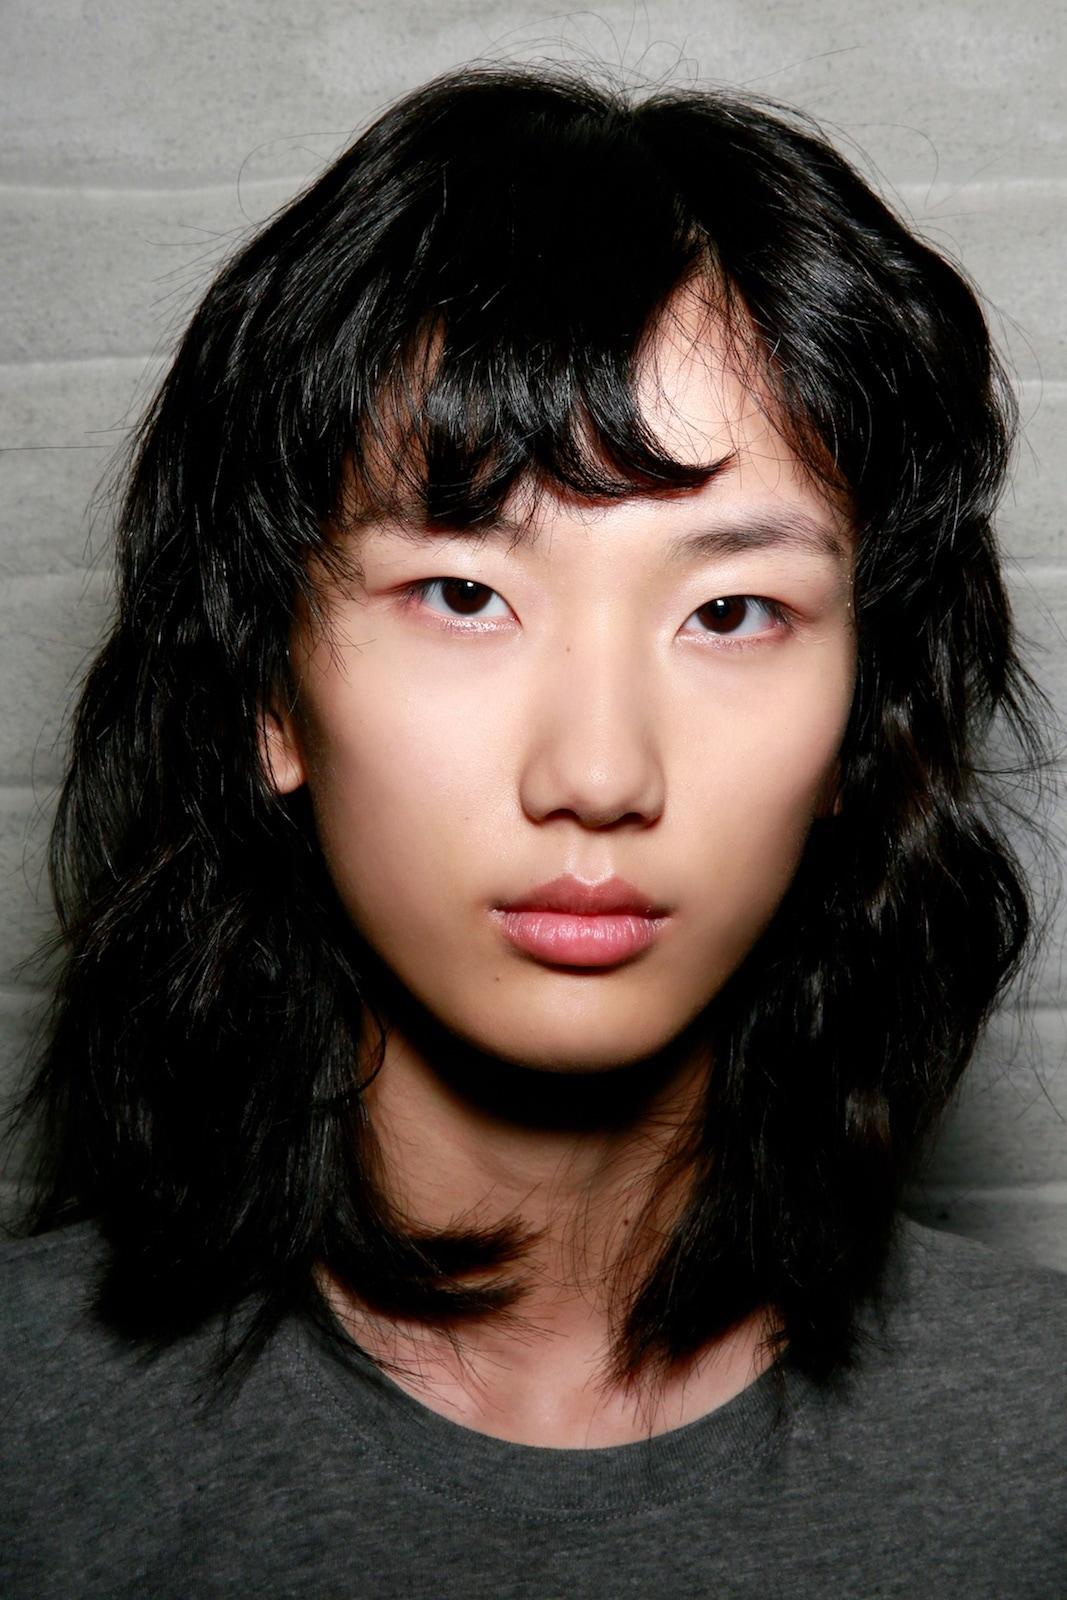 Wanita asia gaya rambut bob shaggy fashion rambut pendek - shutterstock.